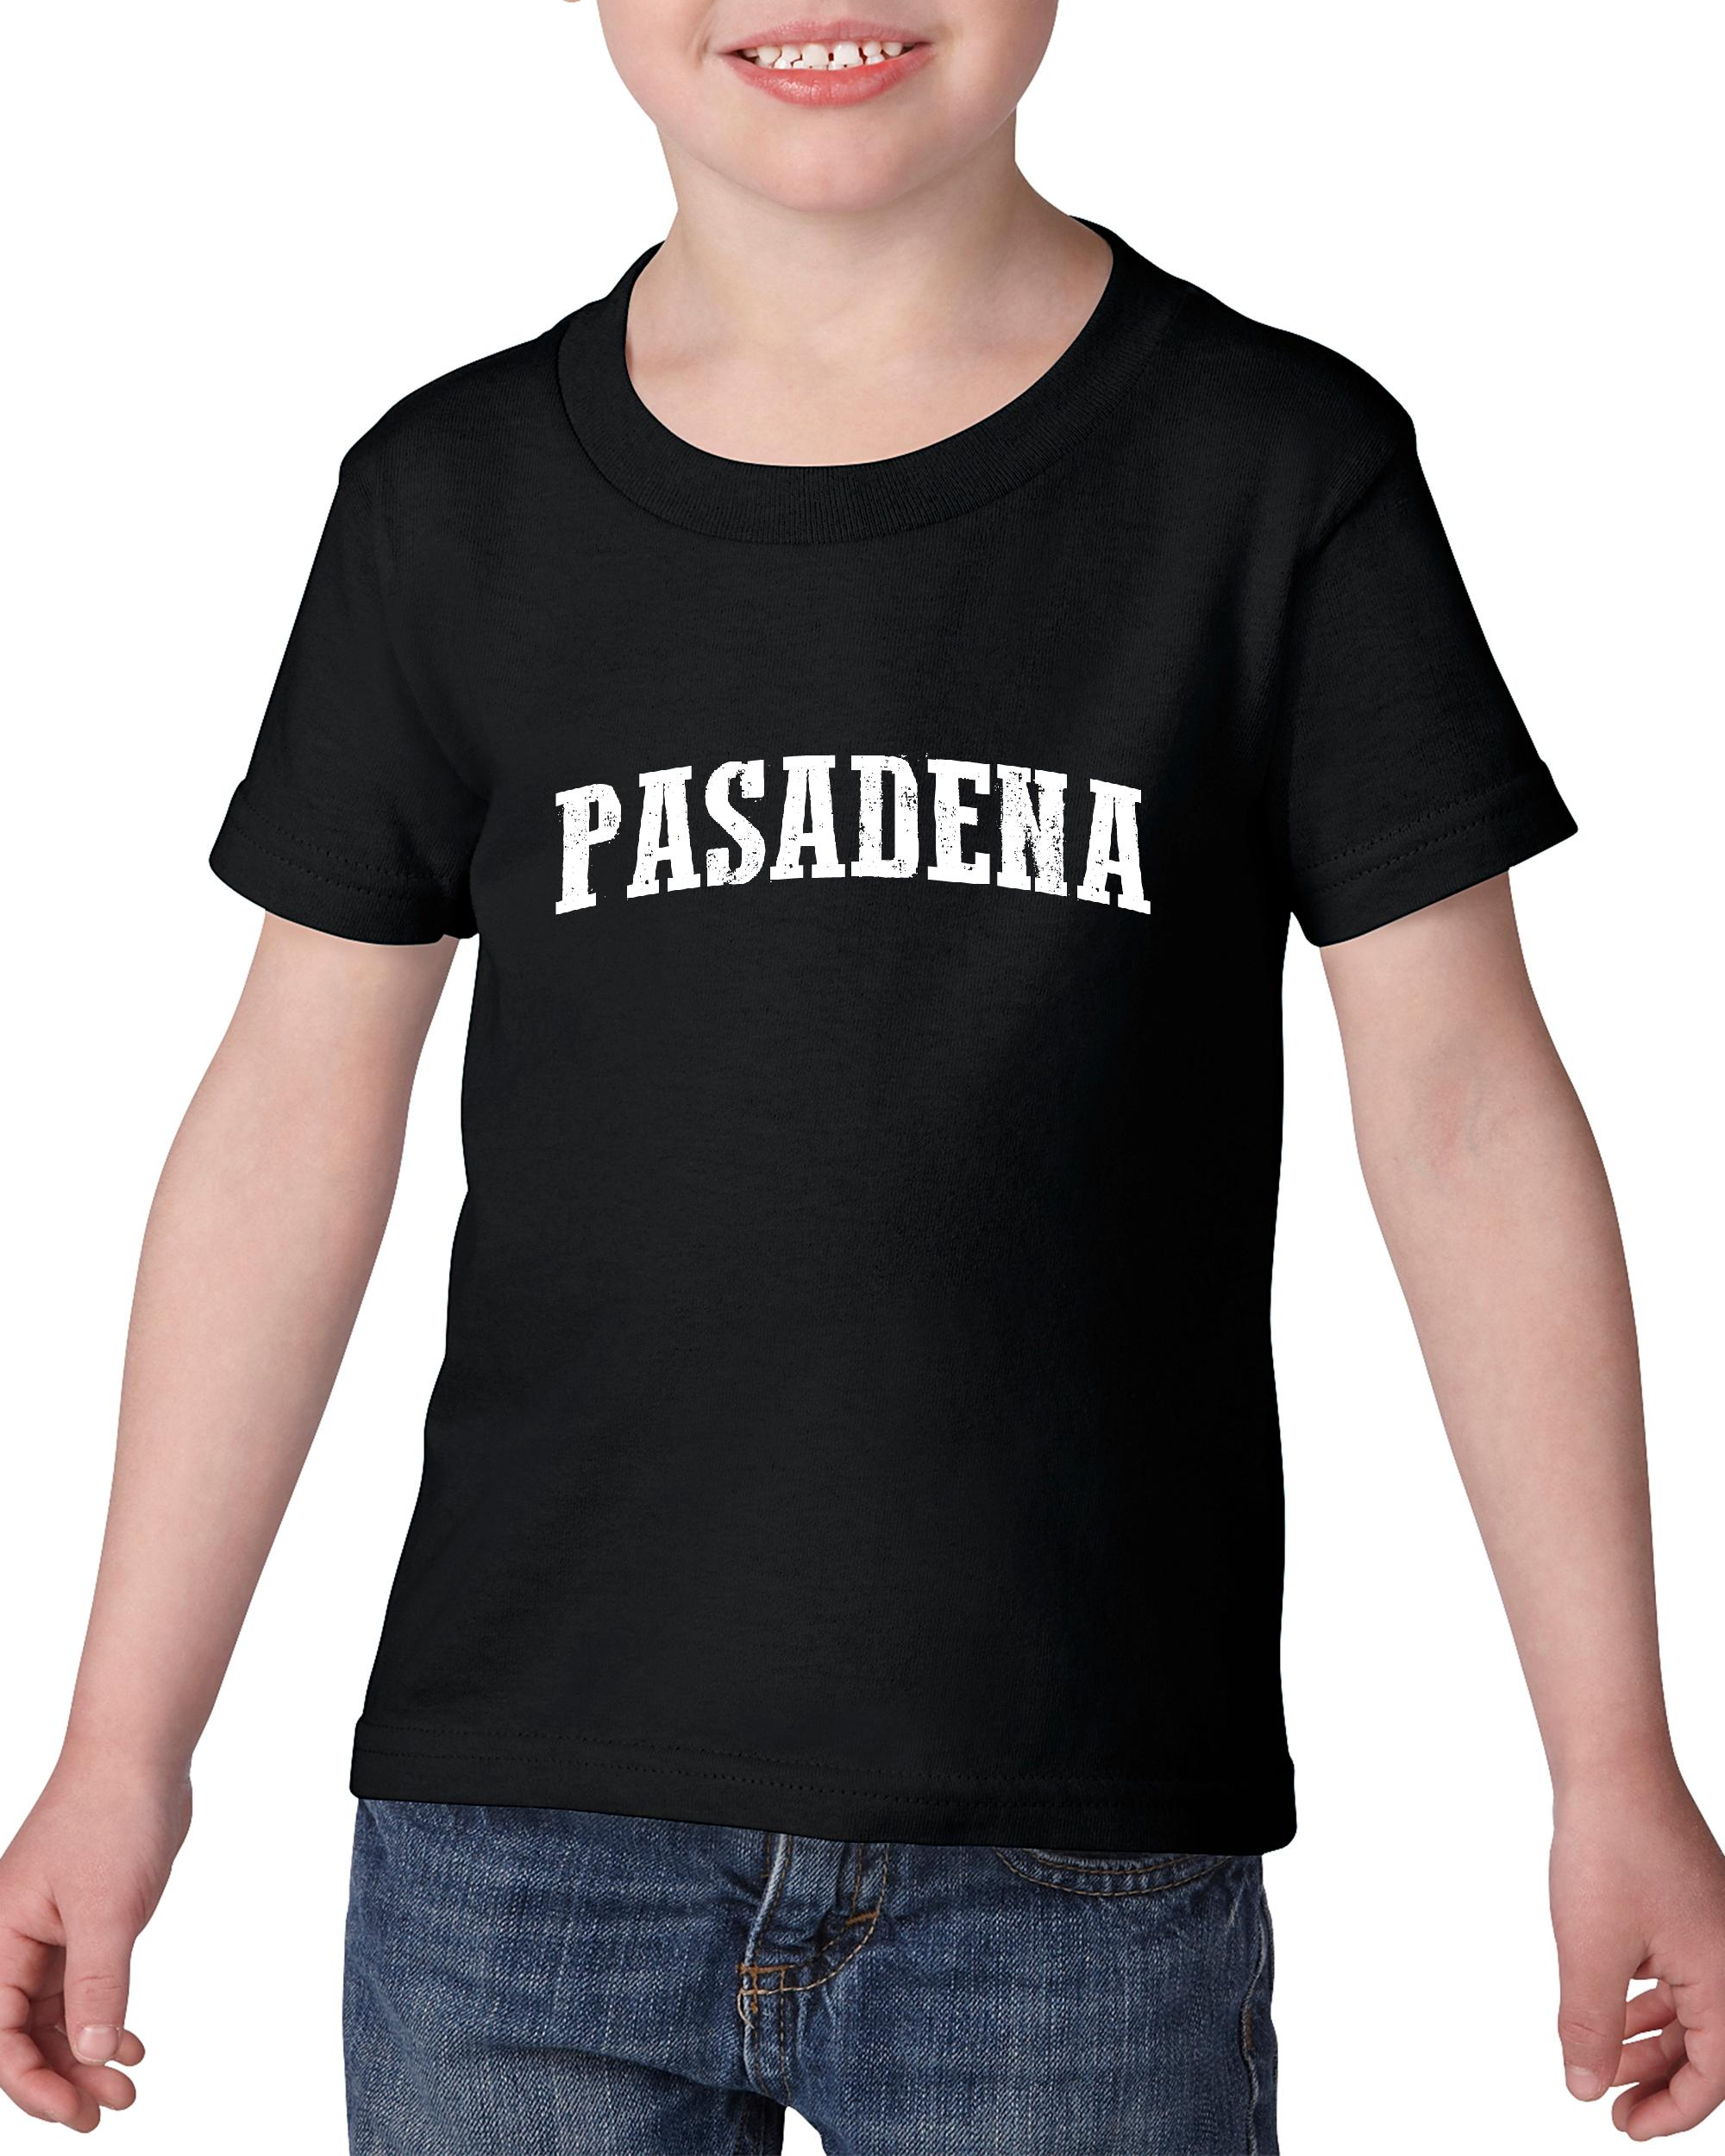 Artix Pasadena TX Texas Flag Houston Map Longhorns Bobcats Home Texas State University Heavy Cotton Toddler Kids T-Shirt Tee Clothing